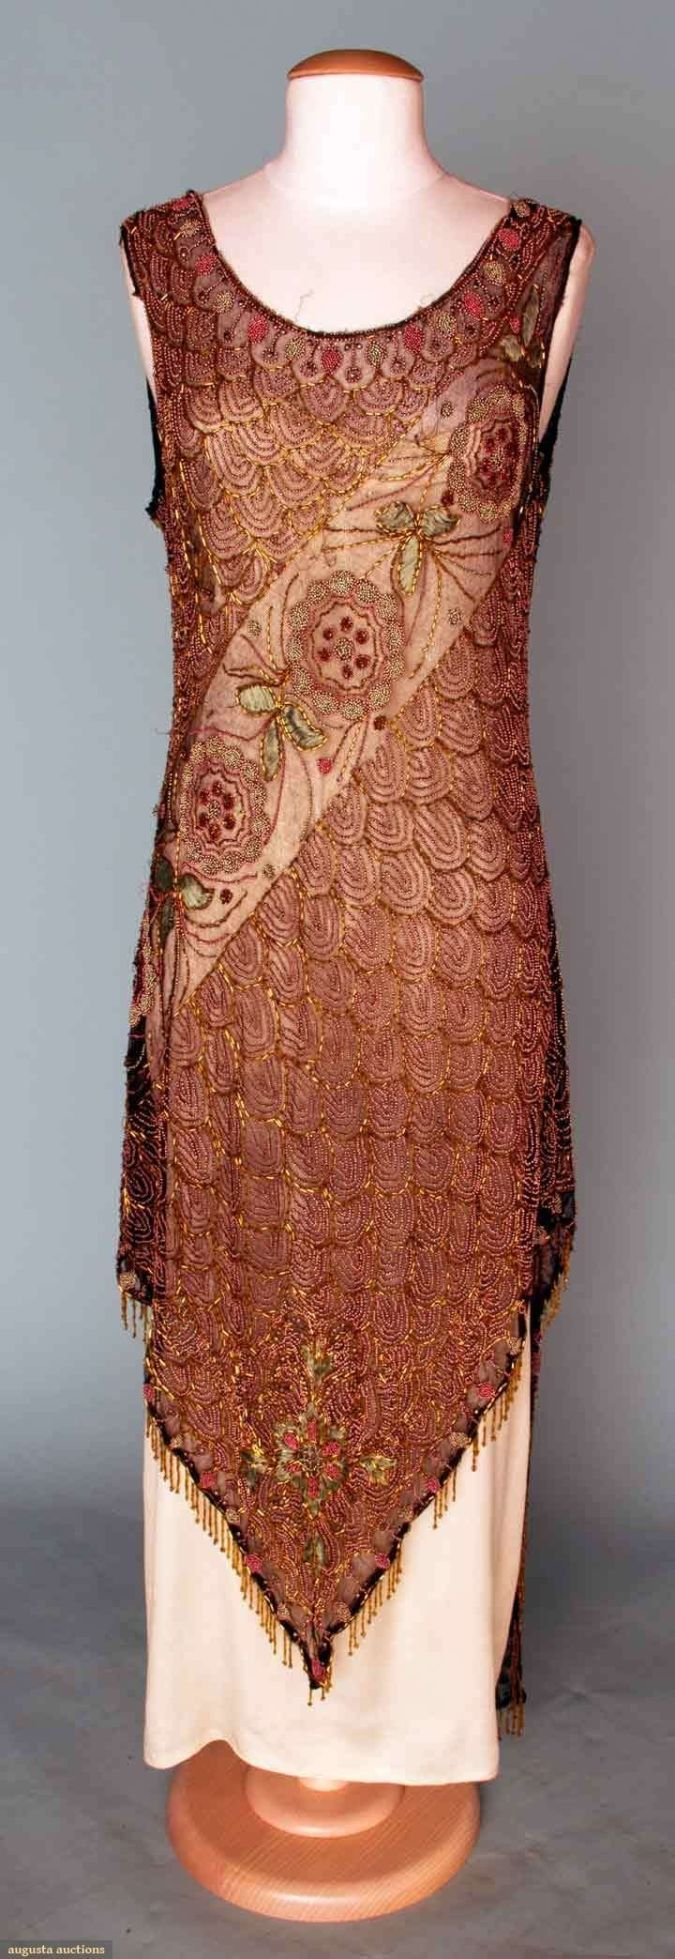 1920s Party Dress